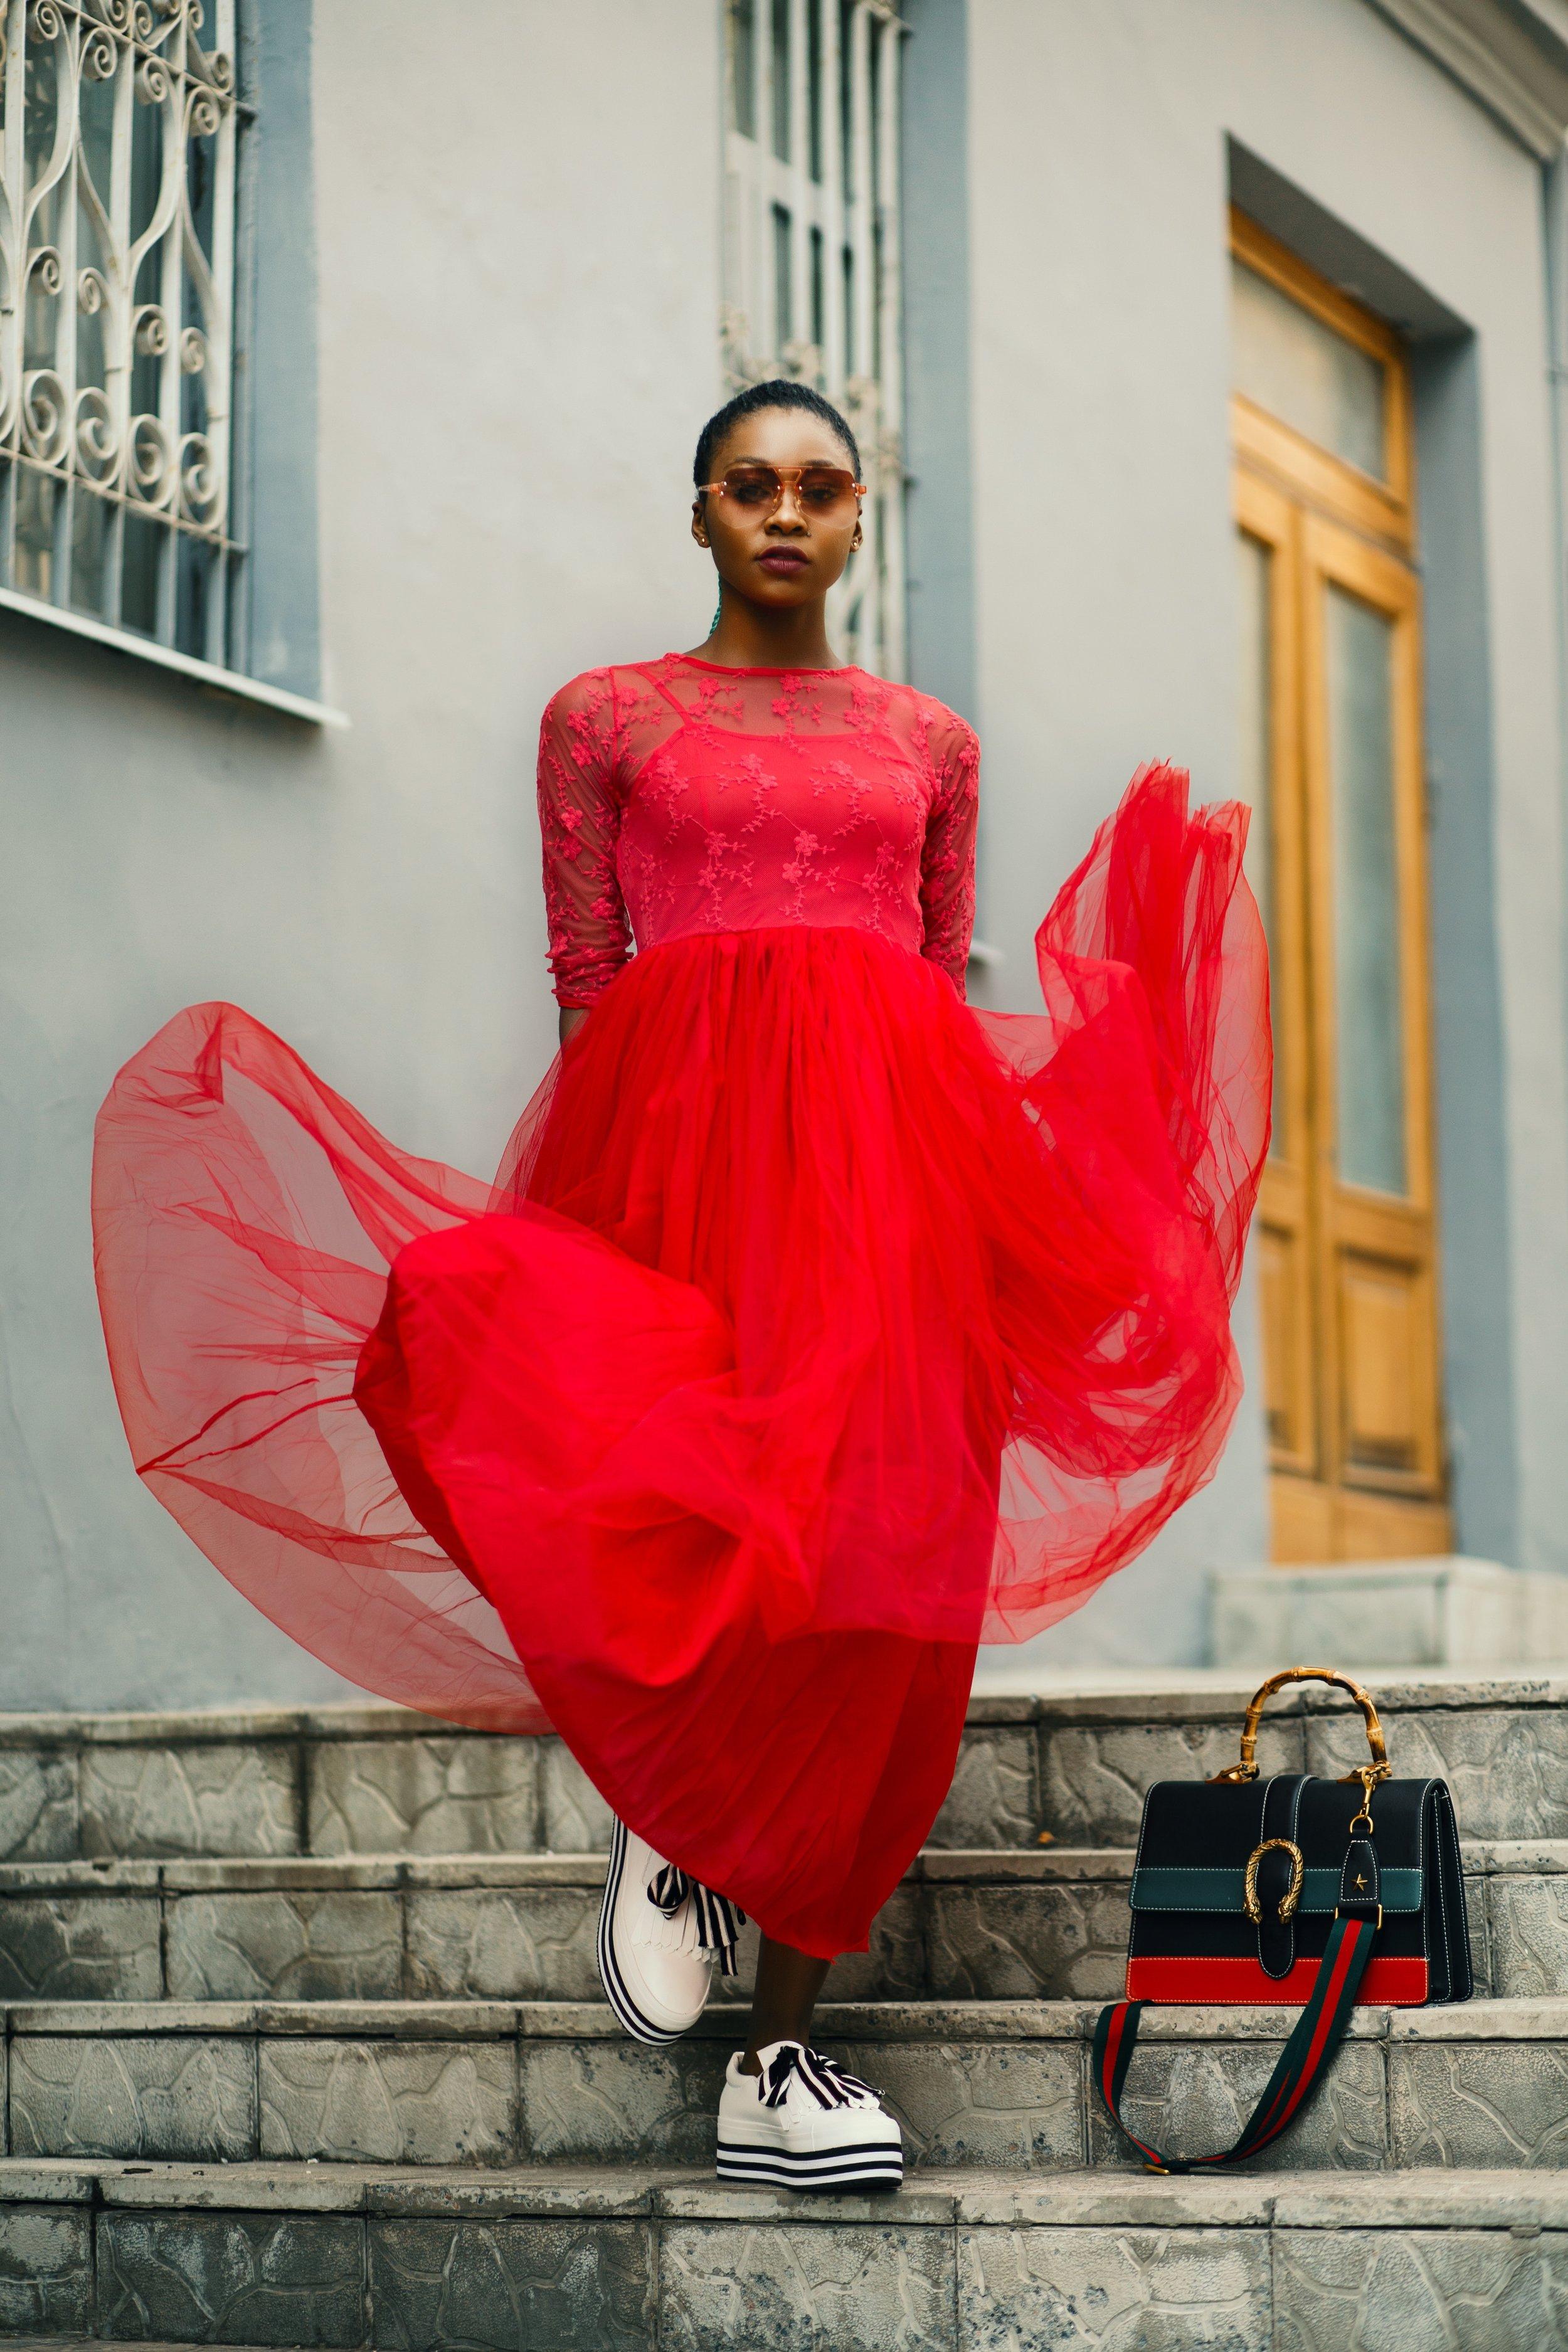 bag-daytime-dress-1377451.jpg